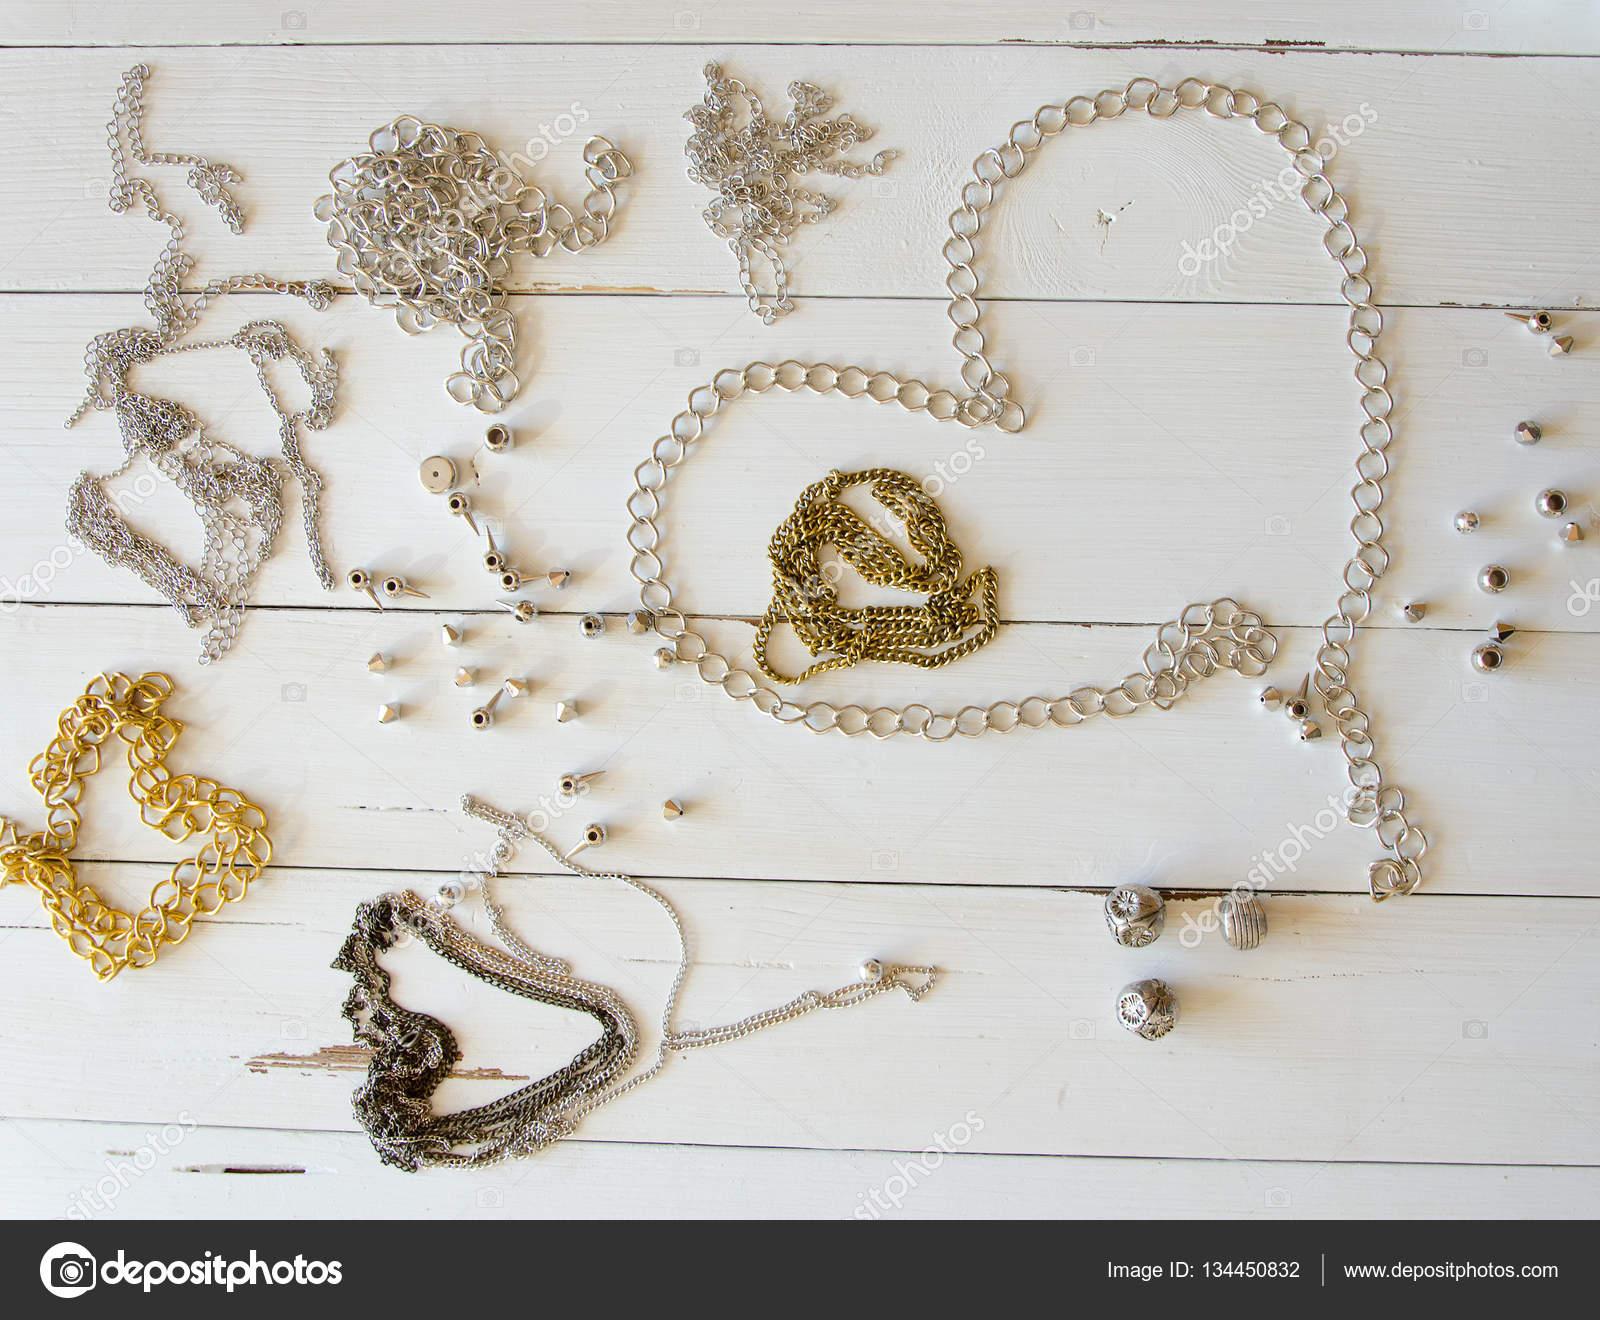 d0d6e192e6 Κοντινό πλάνο της χρυσό κολιέ και αλυσίδες στο ξύλινο τραπέζι. Χειροποίητα  στοιχεία μεταλλικά κοσμήματα